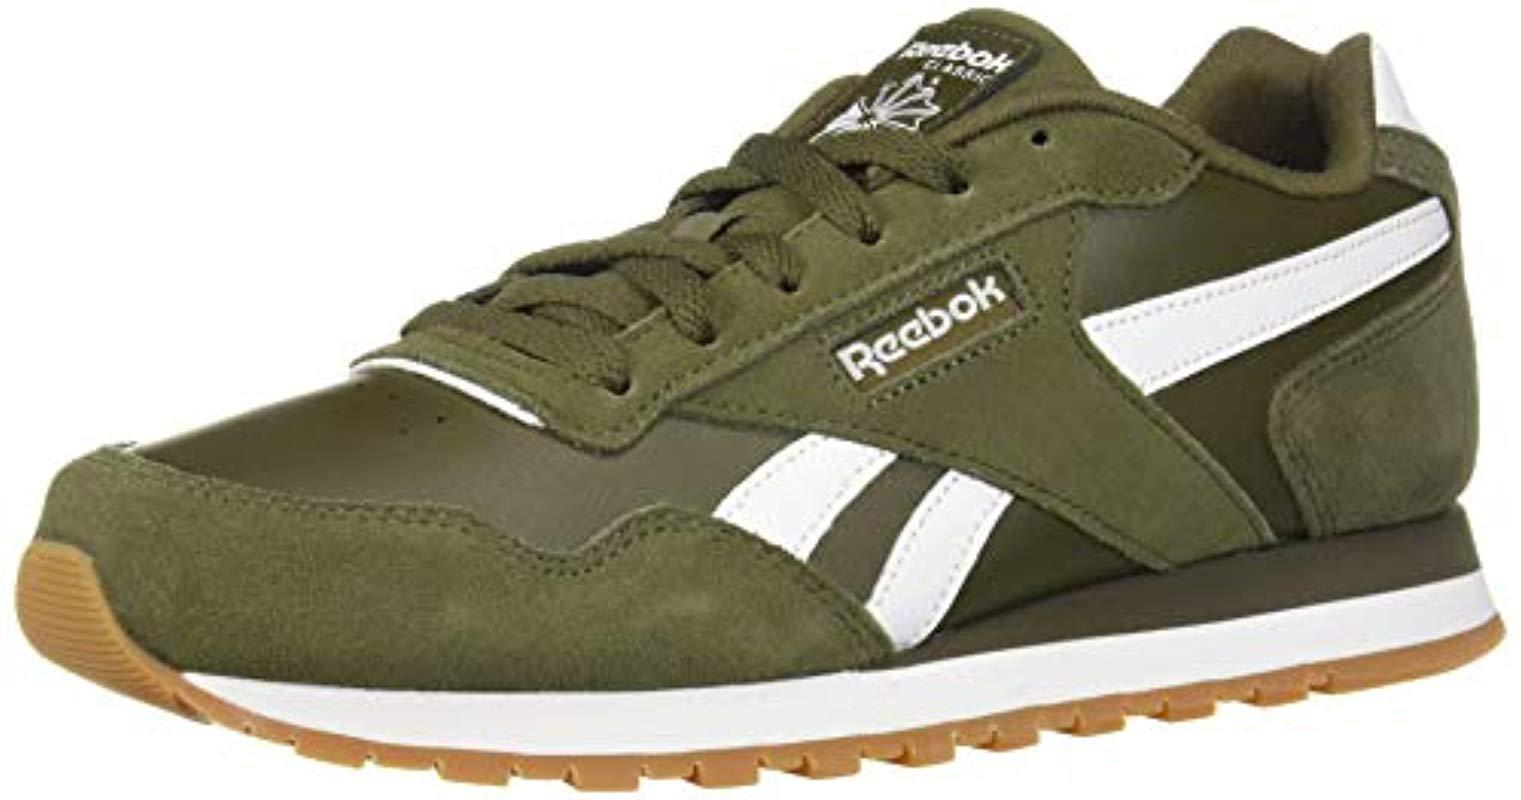 802e0ea877e Reebok - Green Classic Harman Run Sneaker for Men - Lyst. View fullscreen